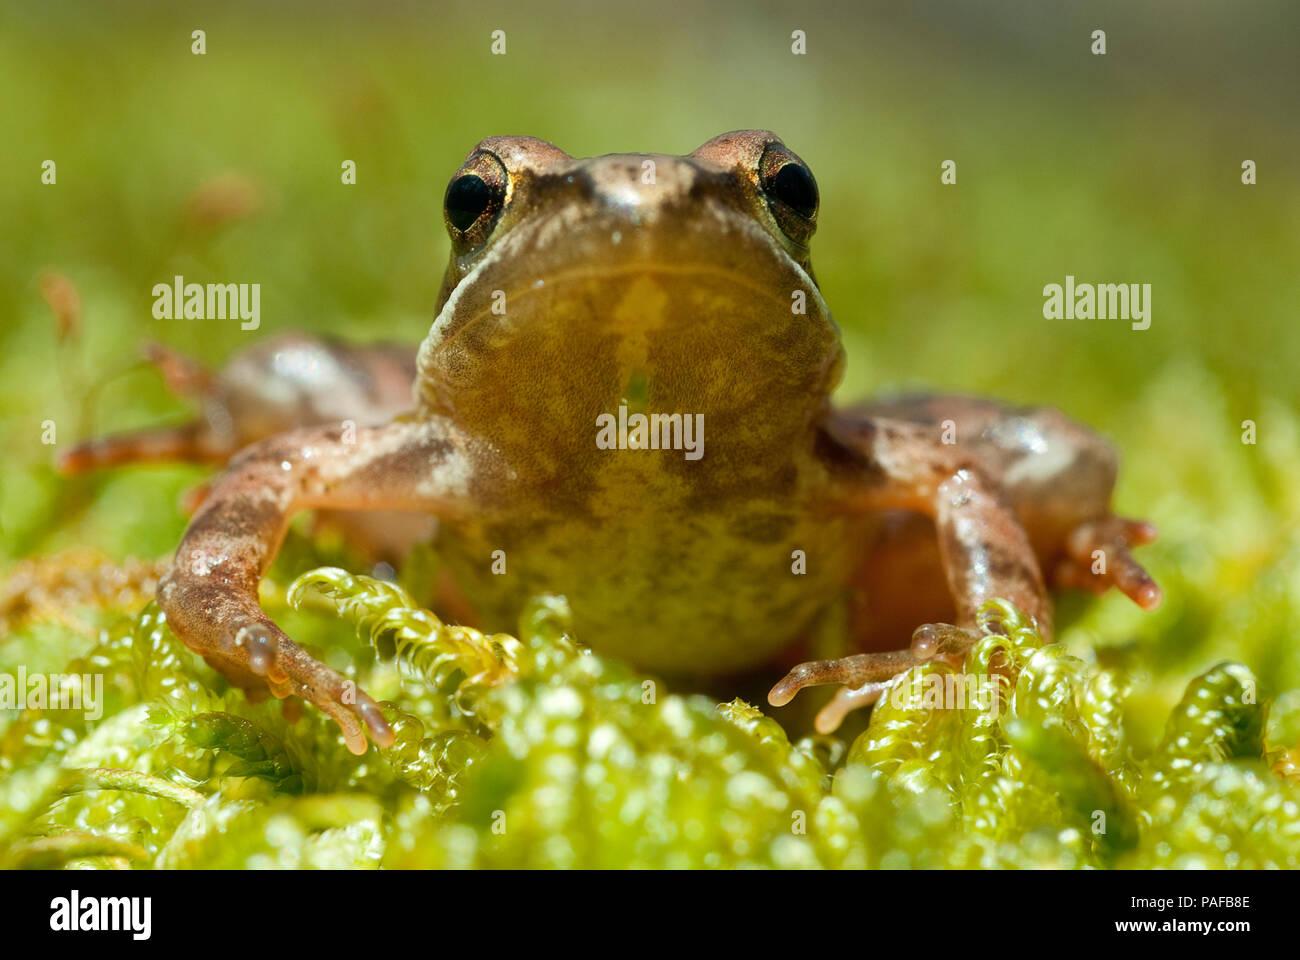 Iberian frog (Rana iberica) leggy frog - Stock Image